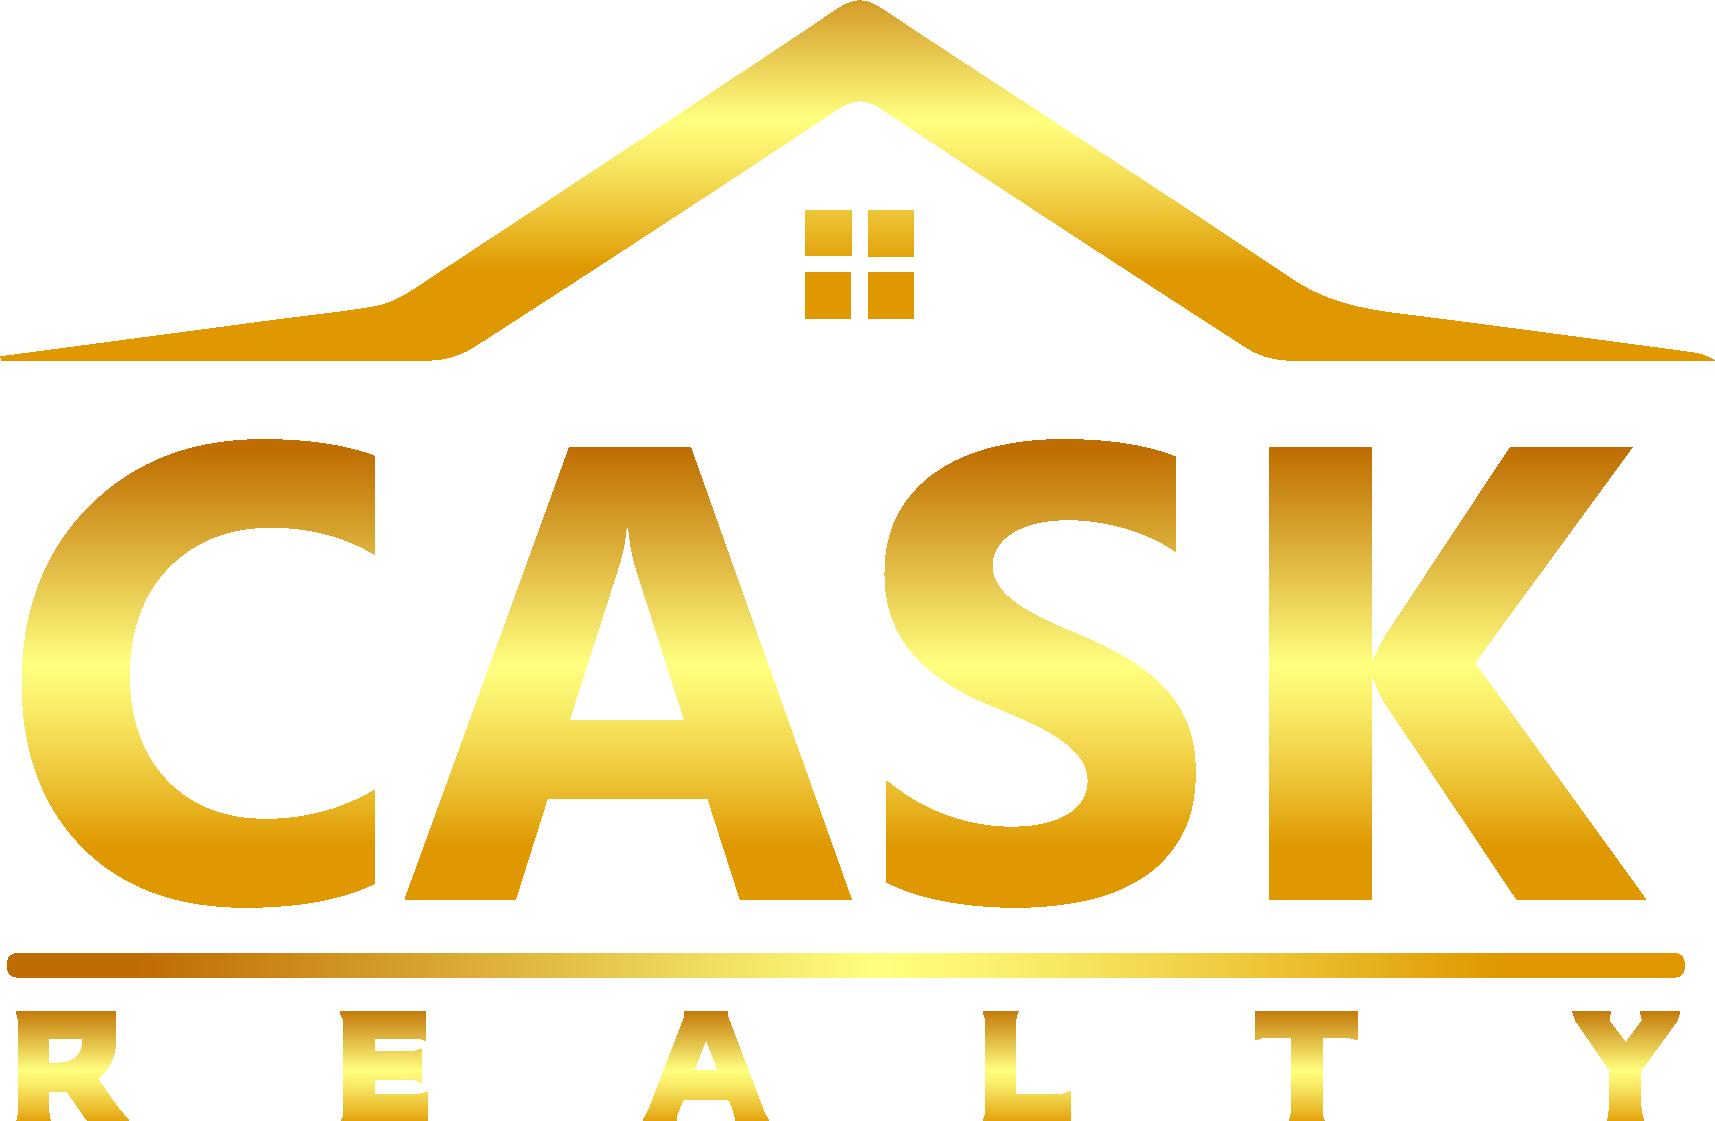 caskrealty.com